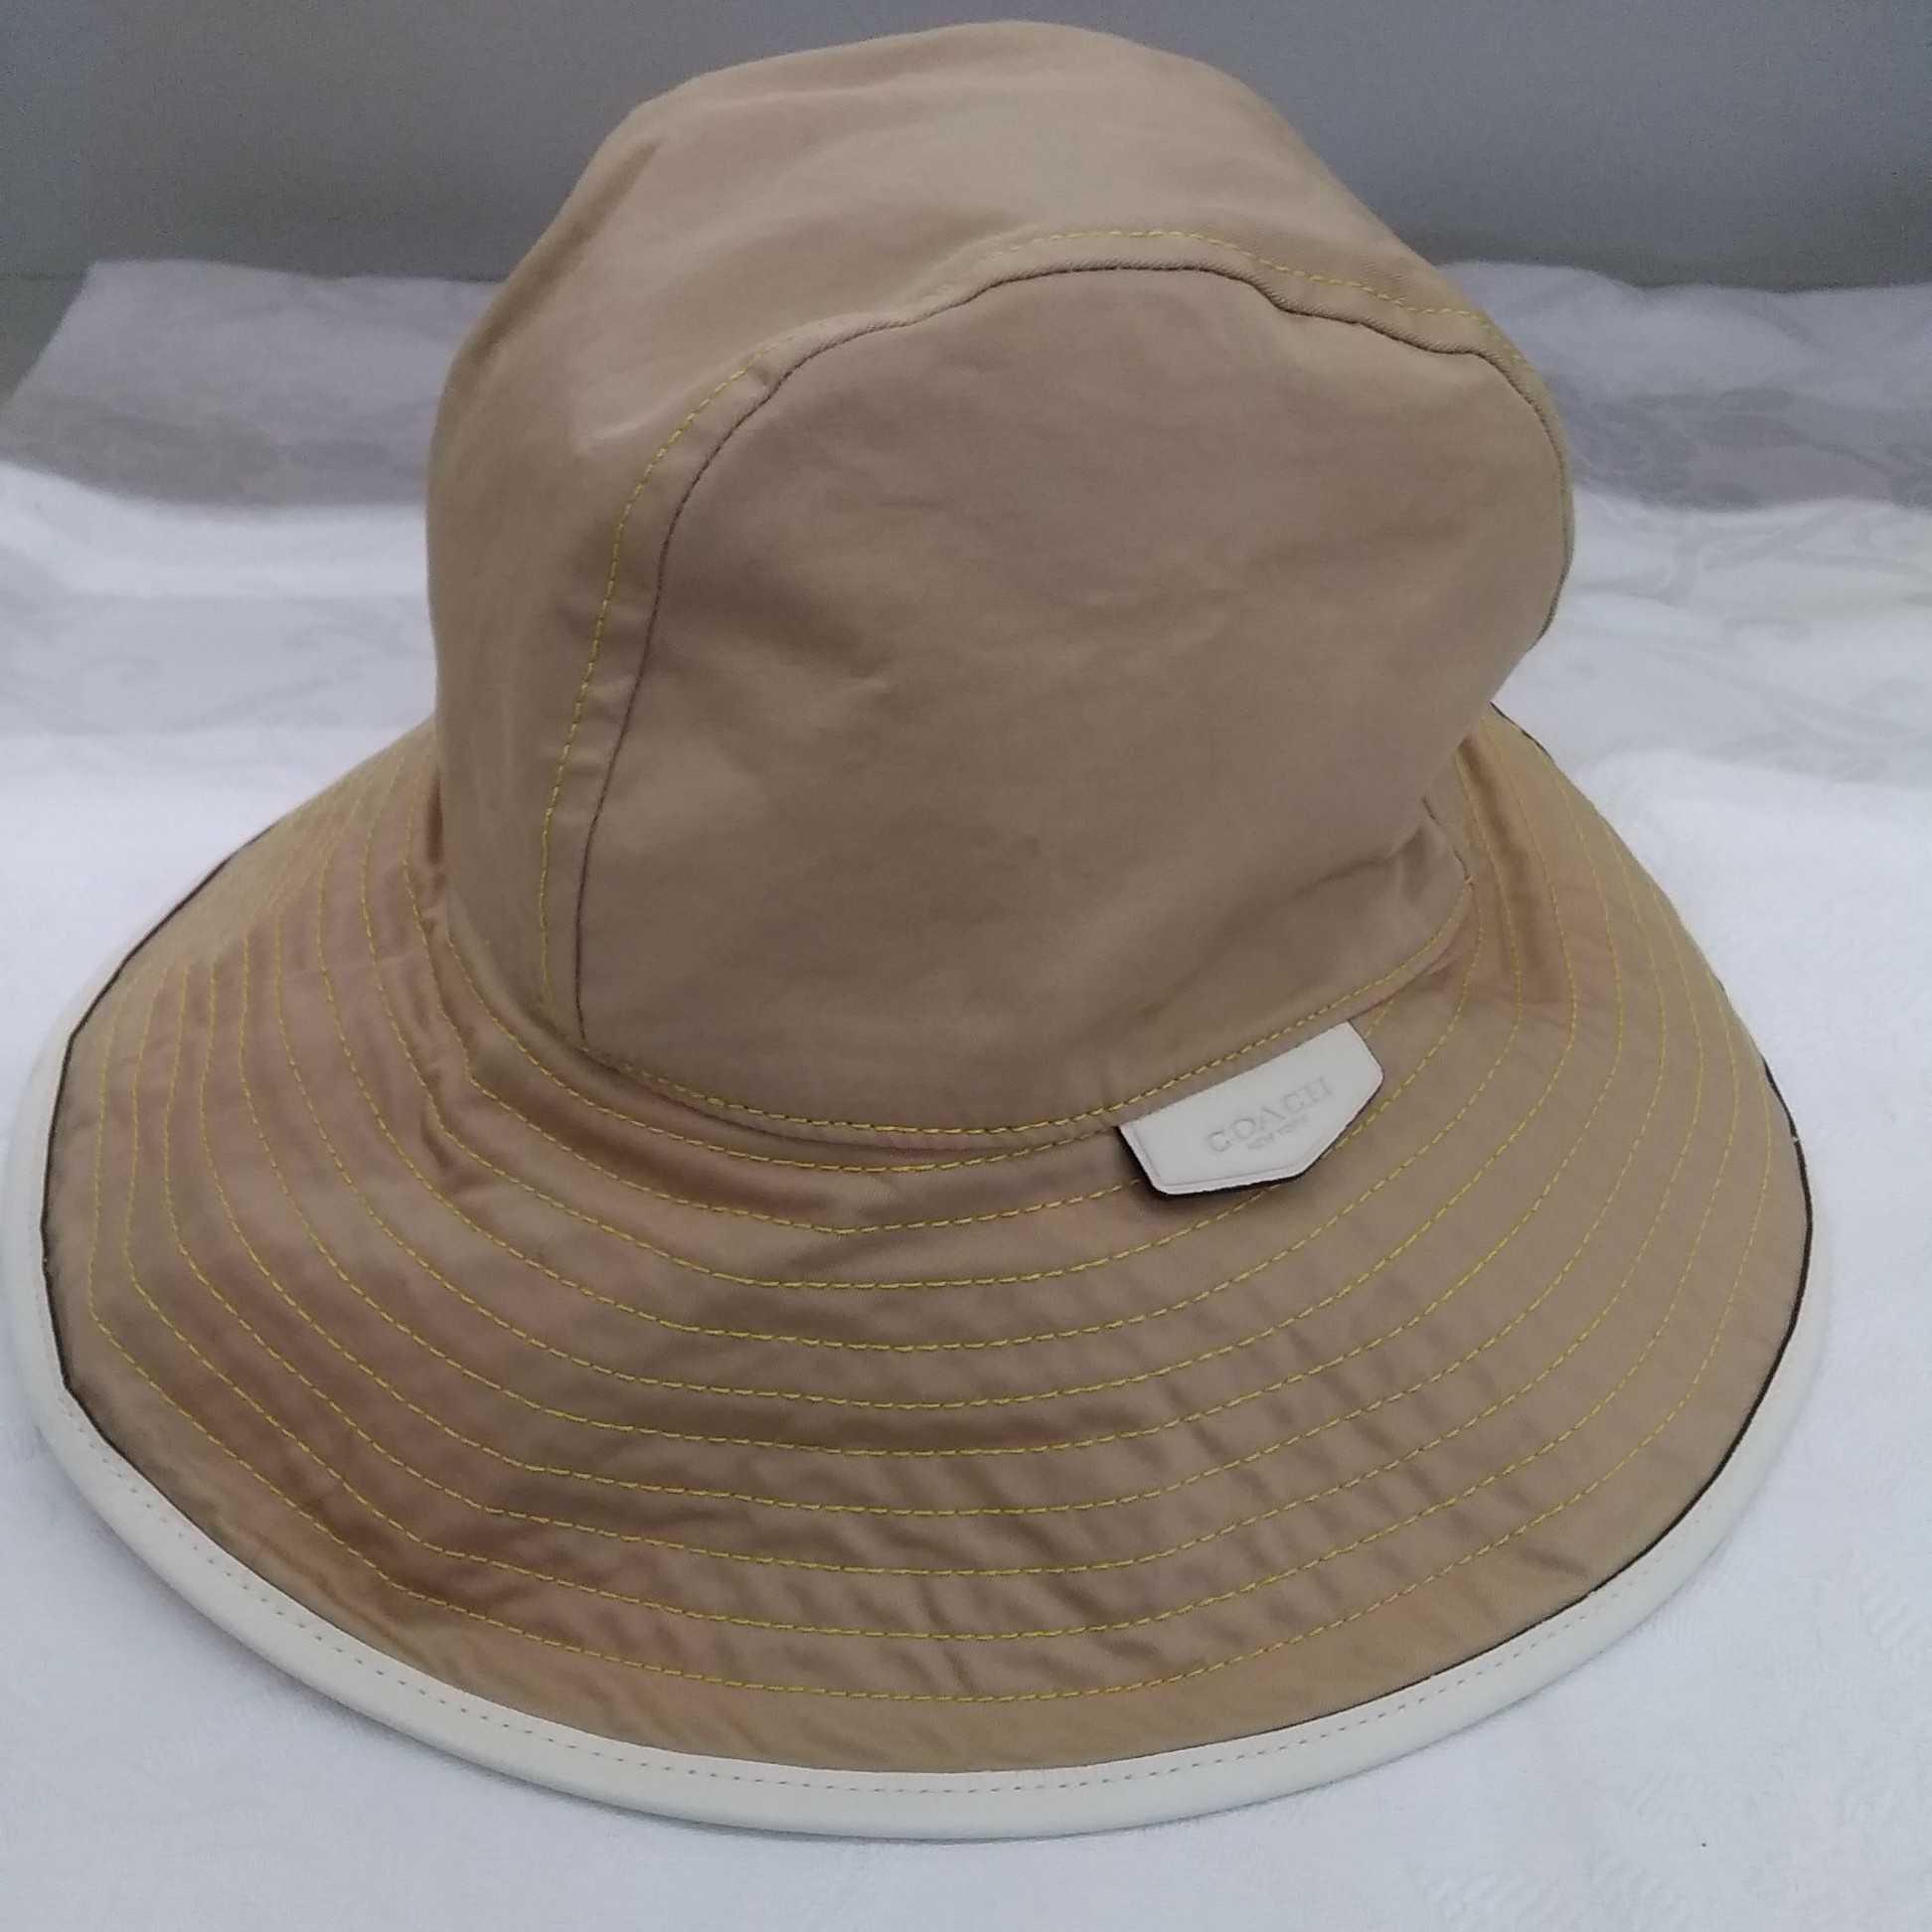 HADLEY PETAL HAT|COACH